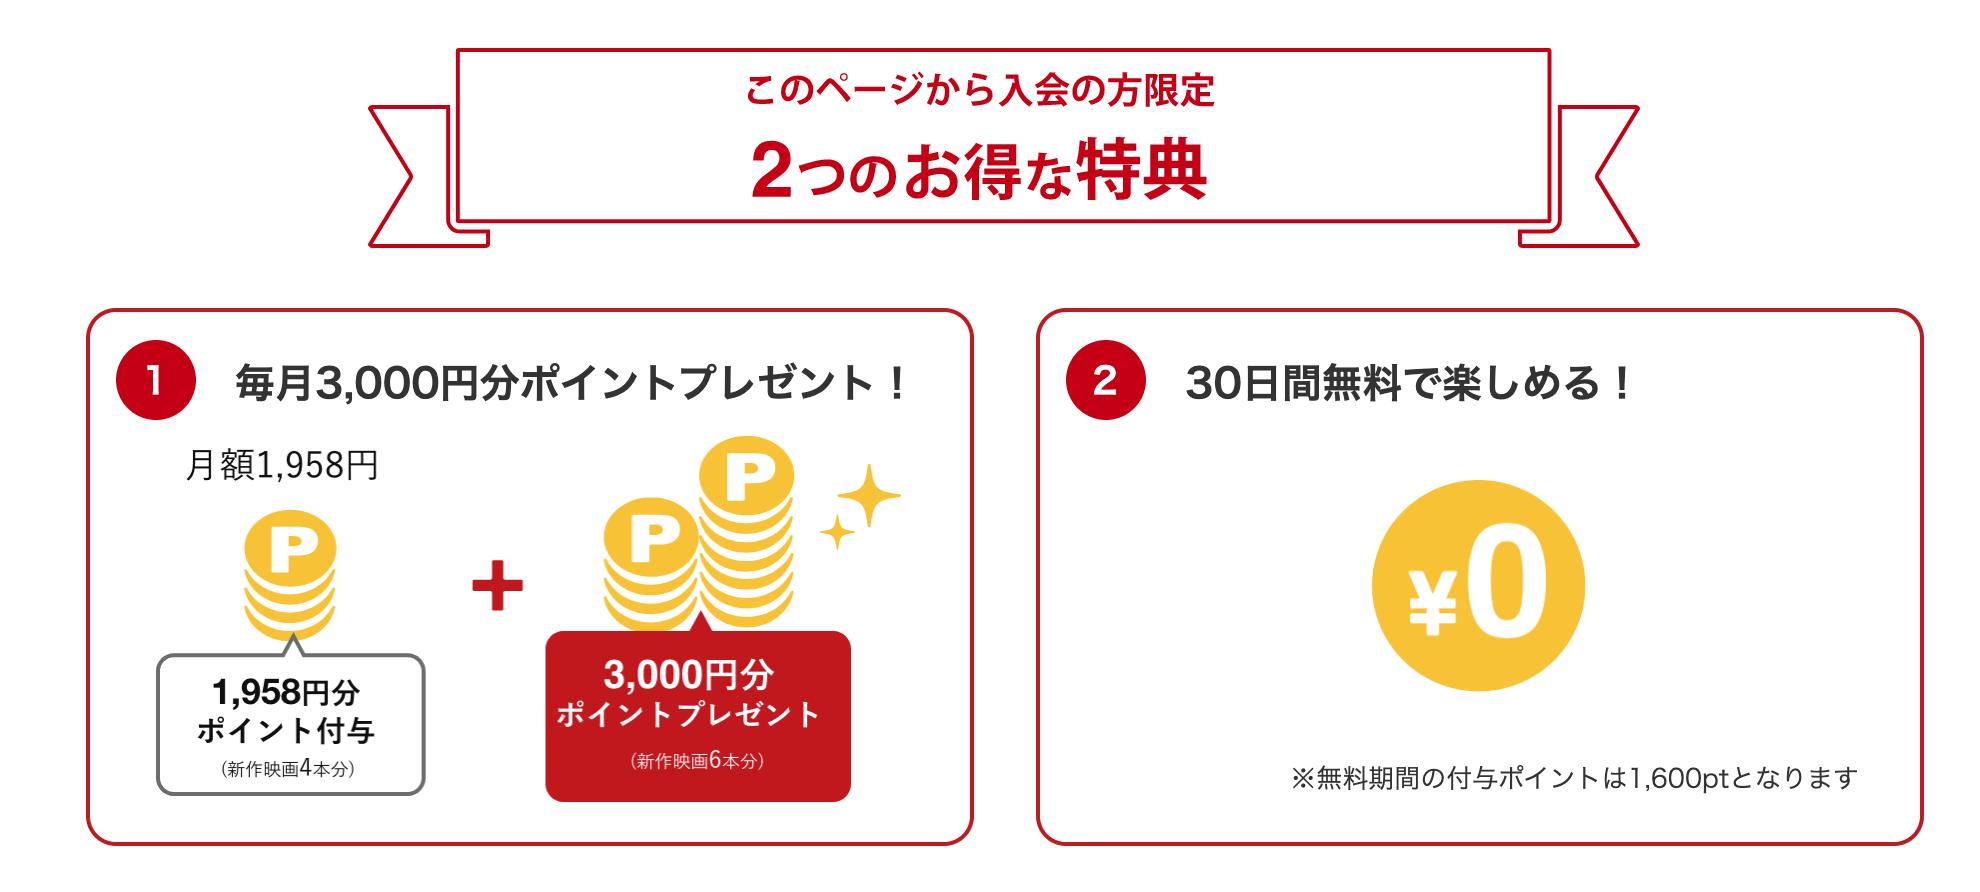 music.jp 漫画 無料